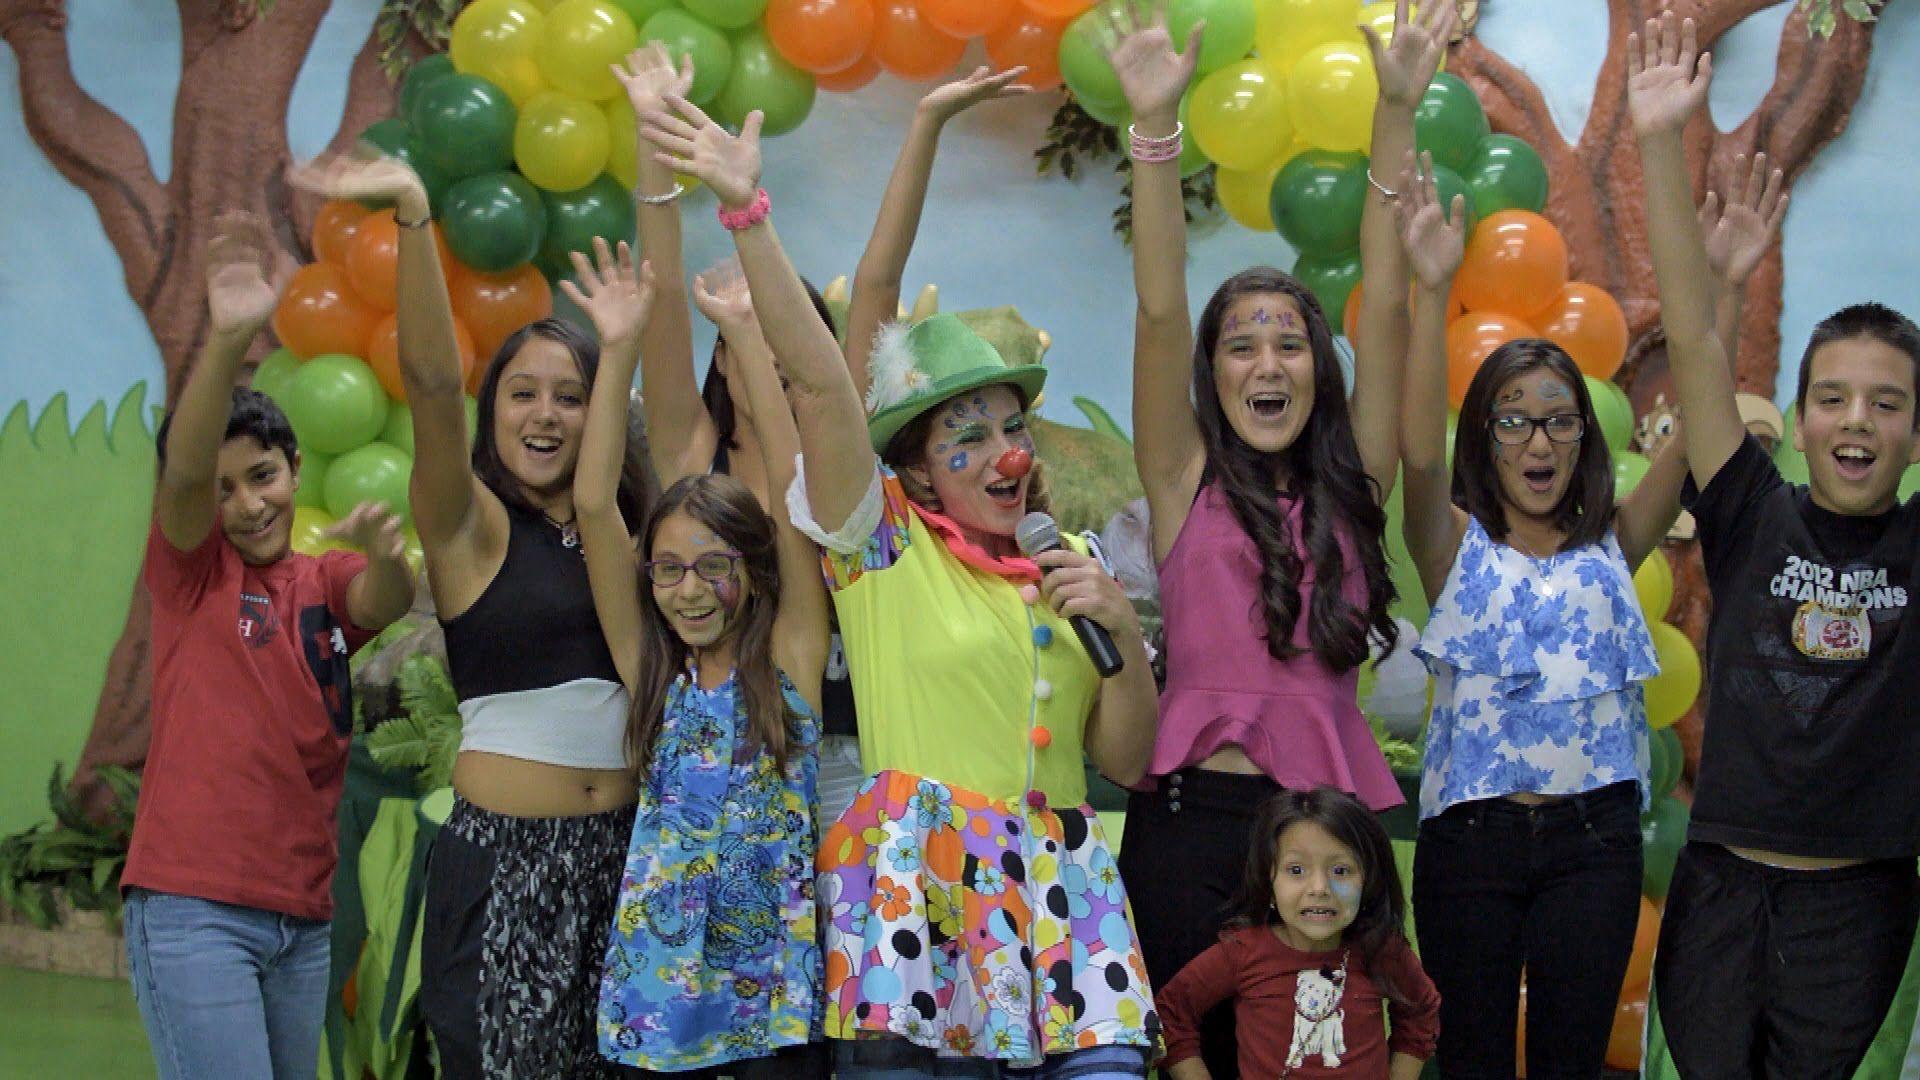 A TOTAL PARTY RENTAL (305)8199614 Salones de fiestas